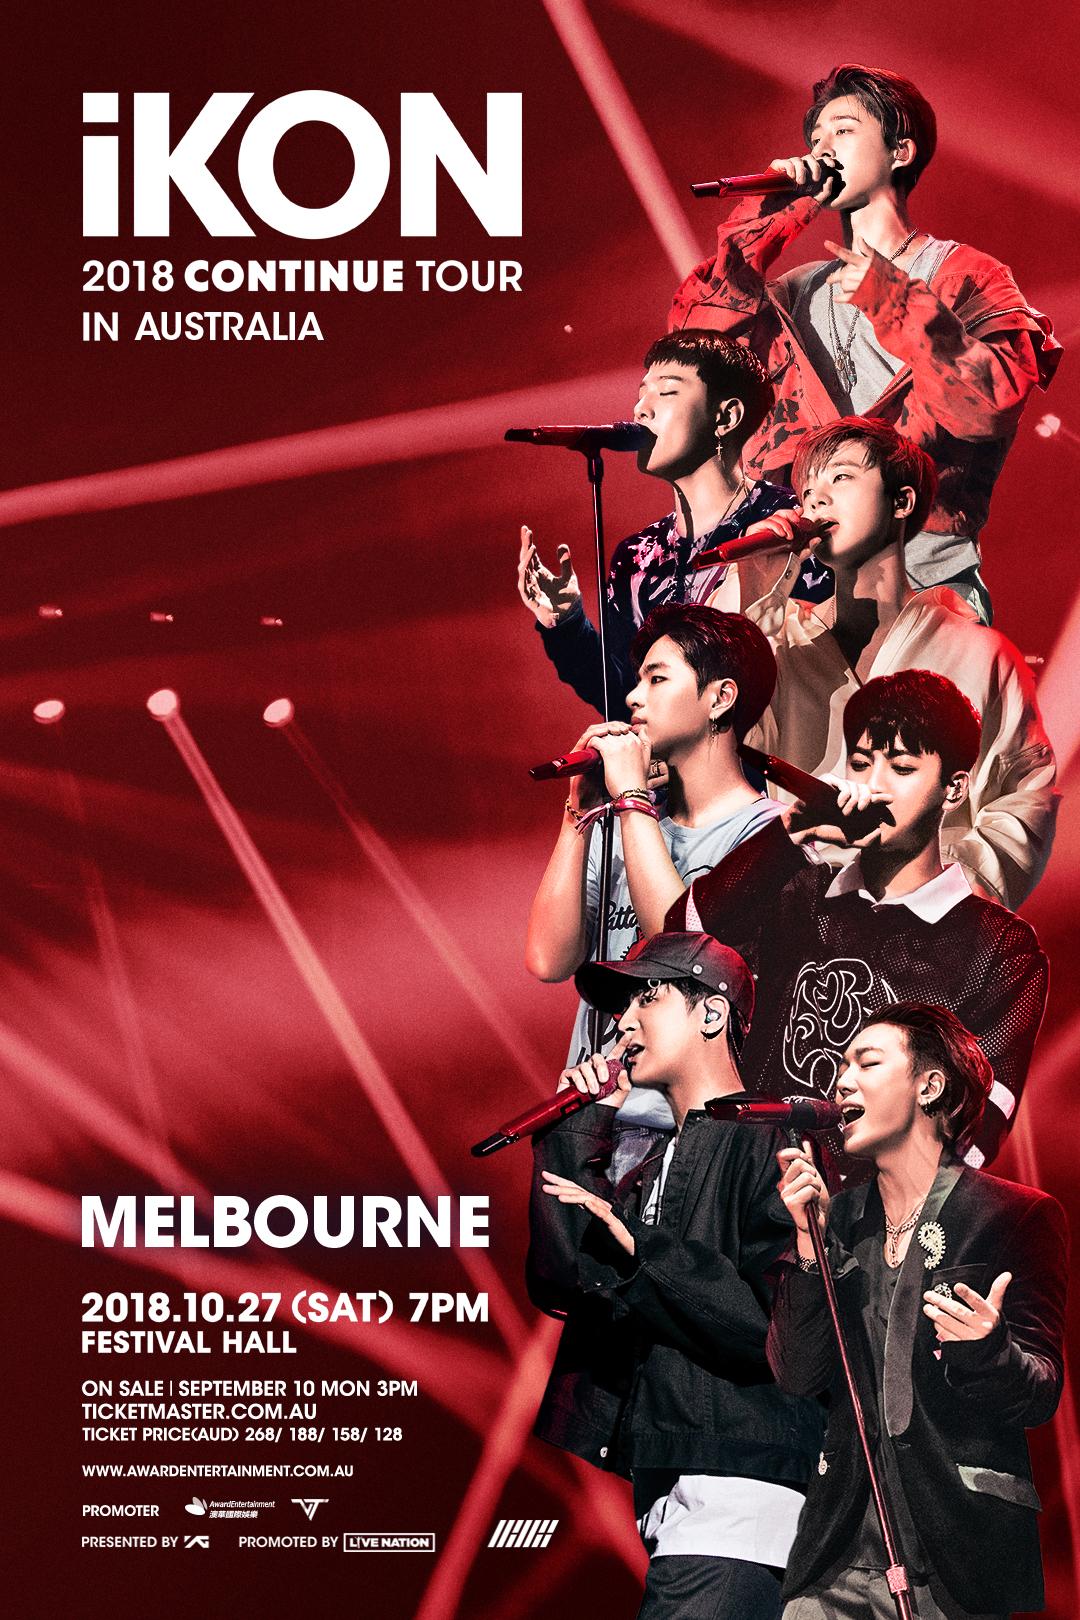 iKON_2018CONTINUETOUR_MELBOURNE_web (1)